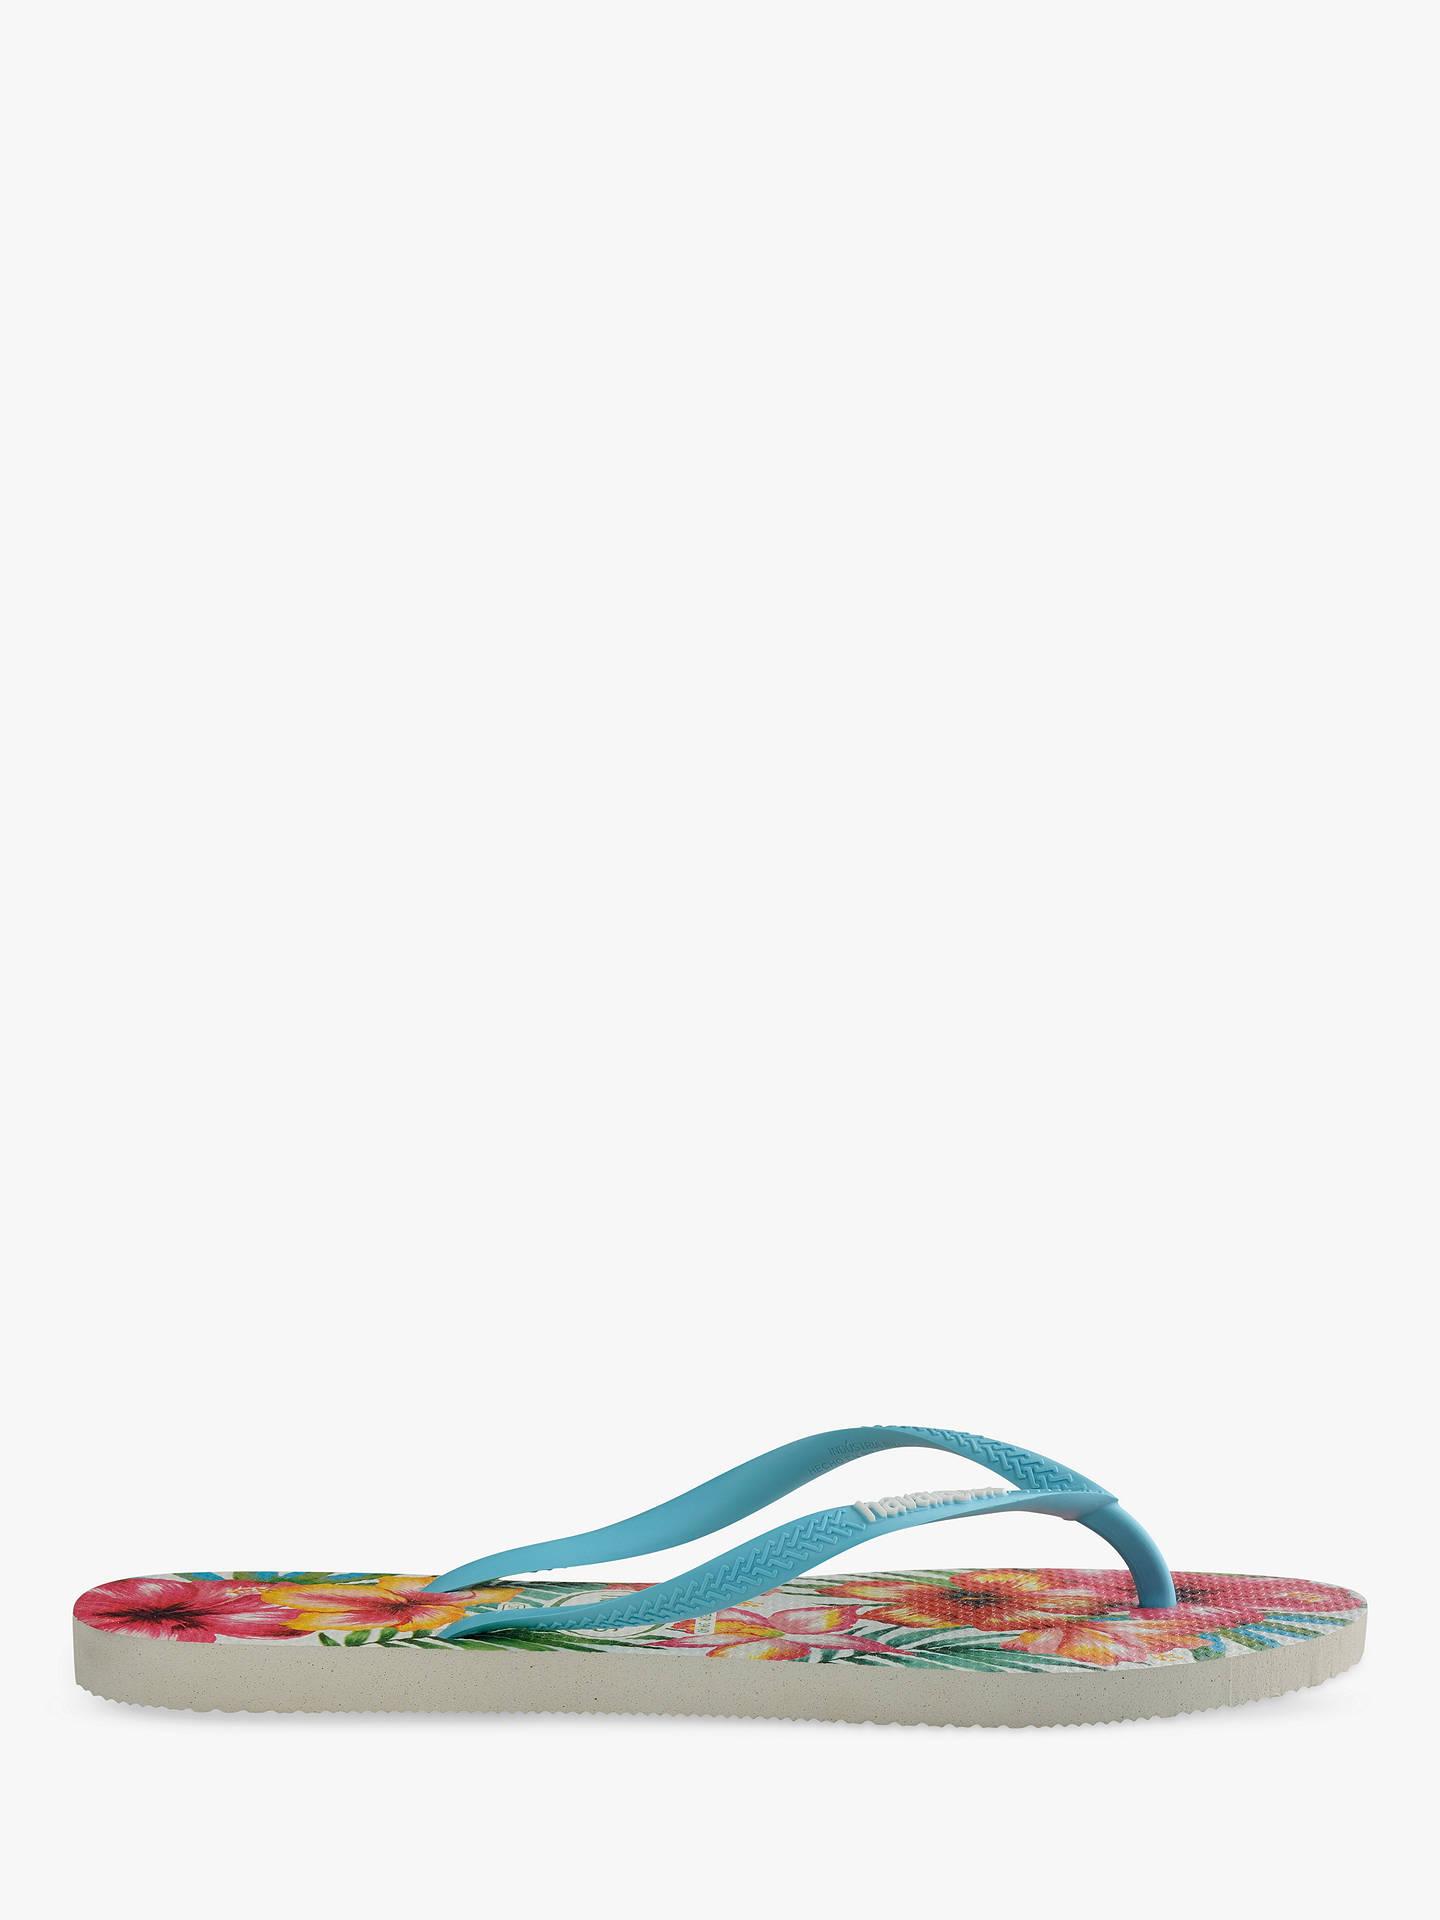 5a6a29e5bbaa57 Buy Havaianas Slim Tropical Flowers Flip Flops